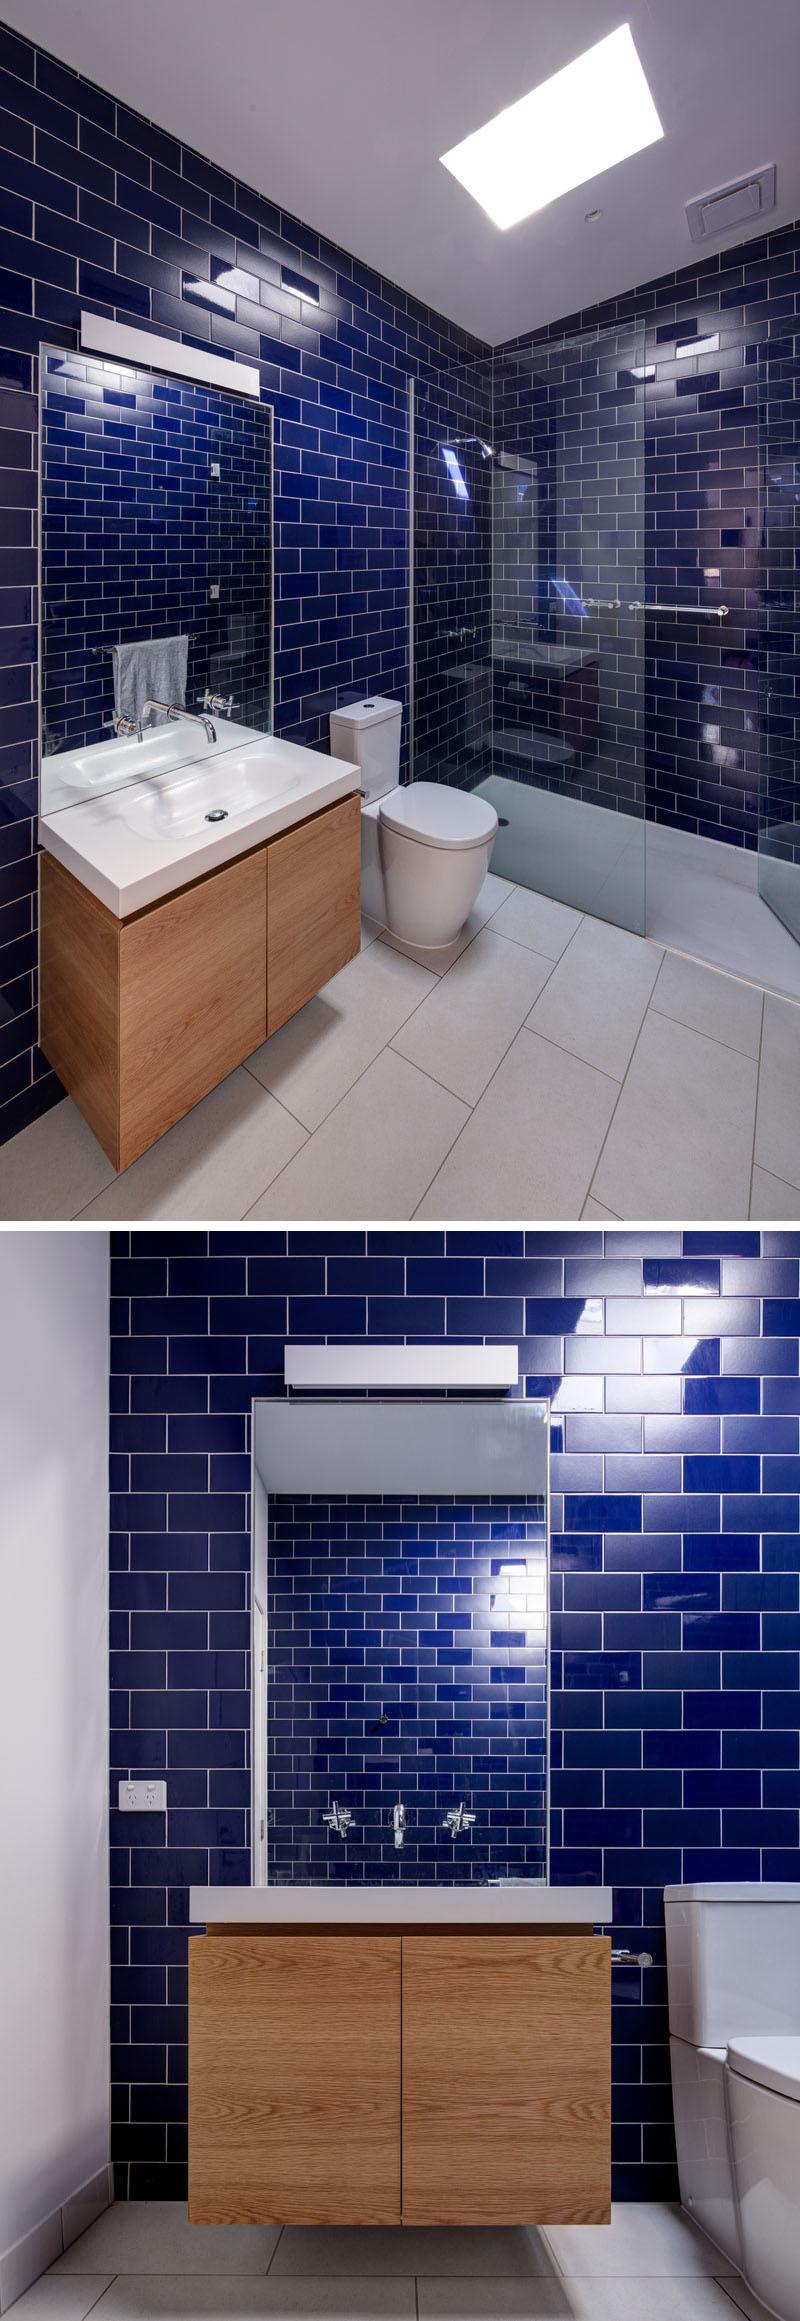 blue-tile-bathroom-231116-1041-08